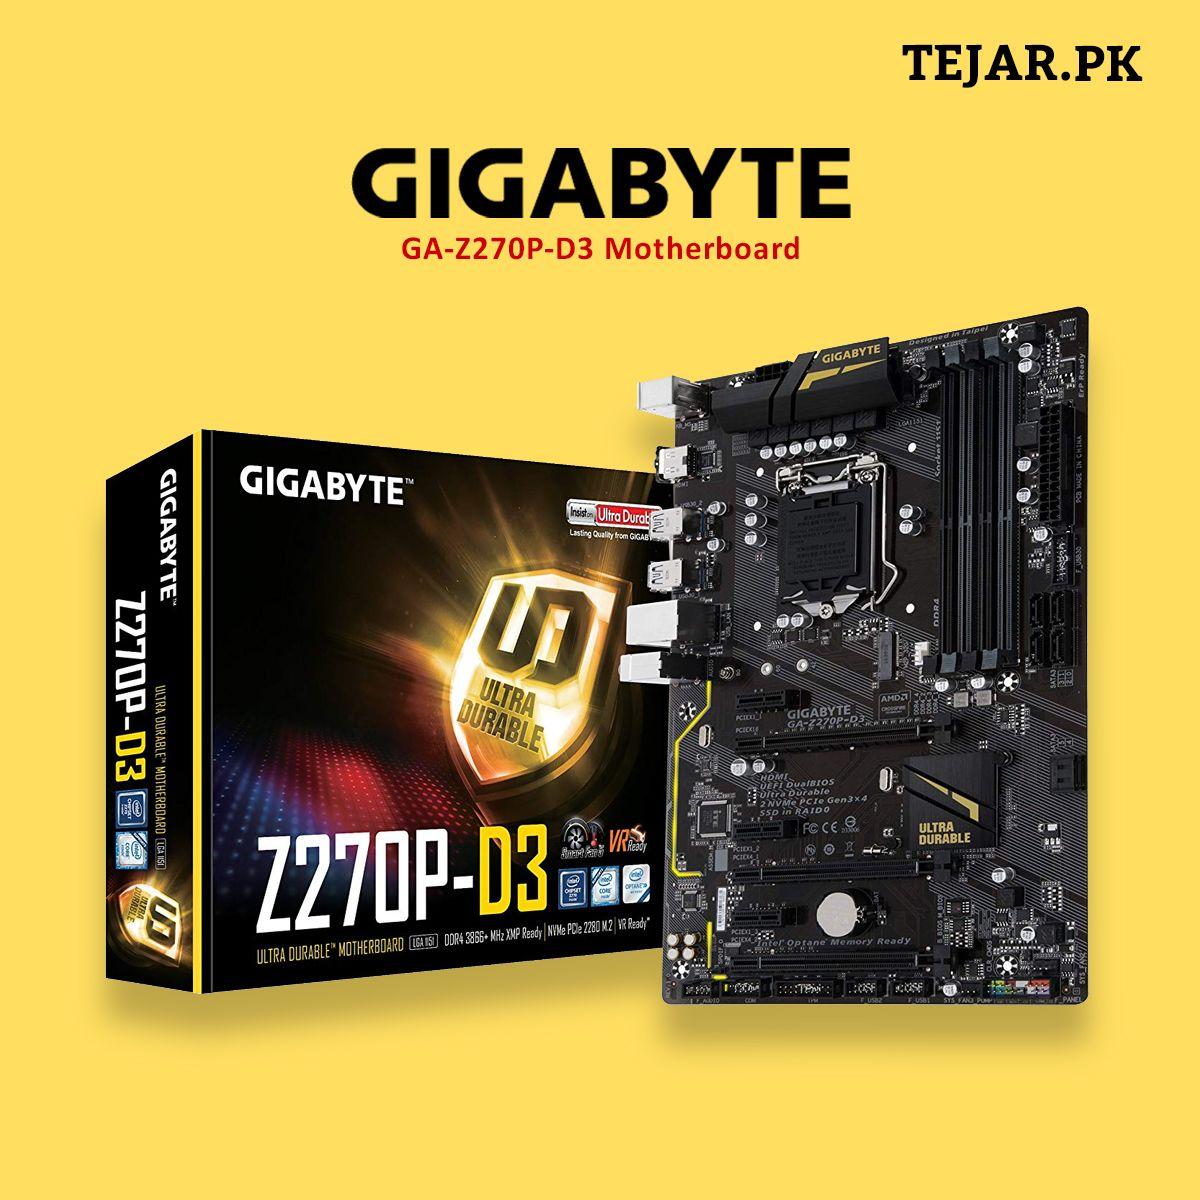 Gigabyte GA-Z270P-D3 Motherboard | Motherboard, Buy computer, Gigabyte